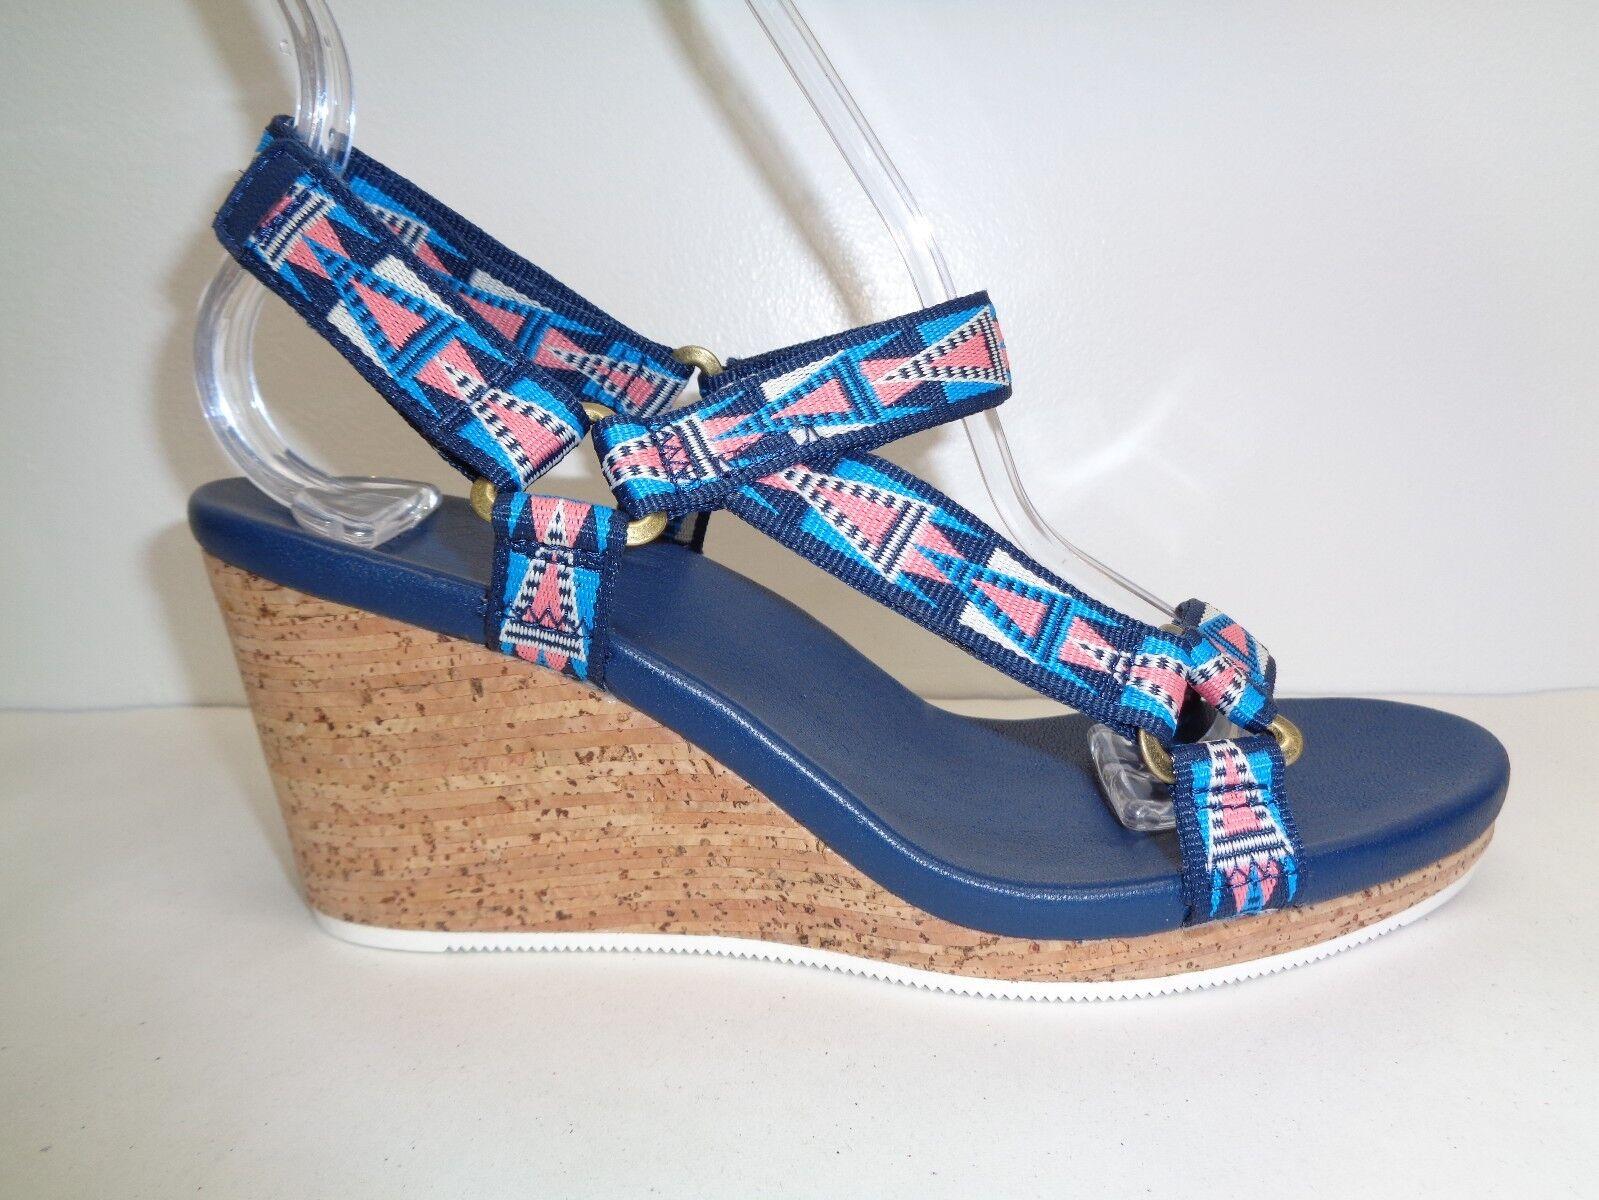 Teva tamaño 8 M arrabelle Universal Mosaico Azul Marino Cuña mujer Sandalias nuevo Zapatos para mujer Cuña 26a00a